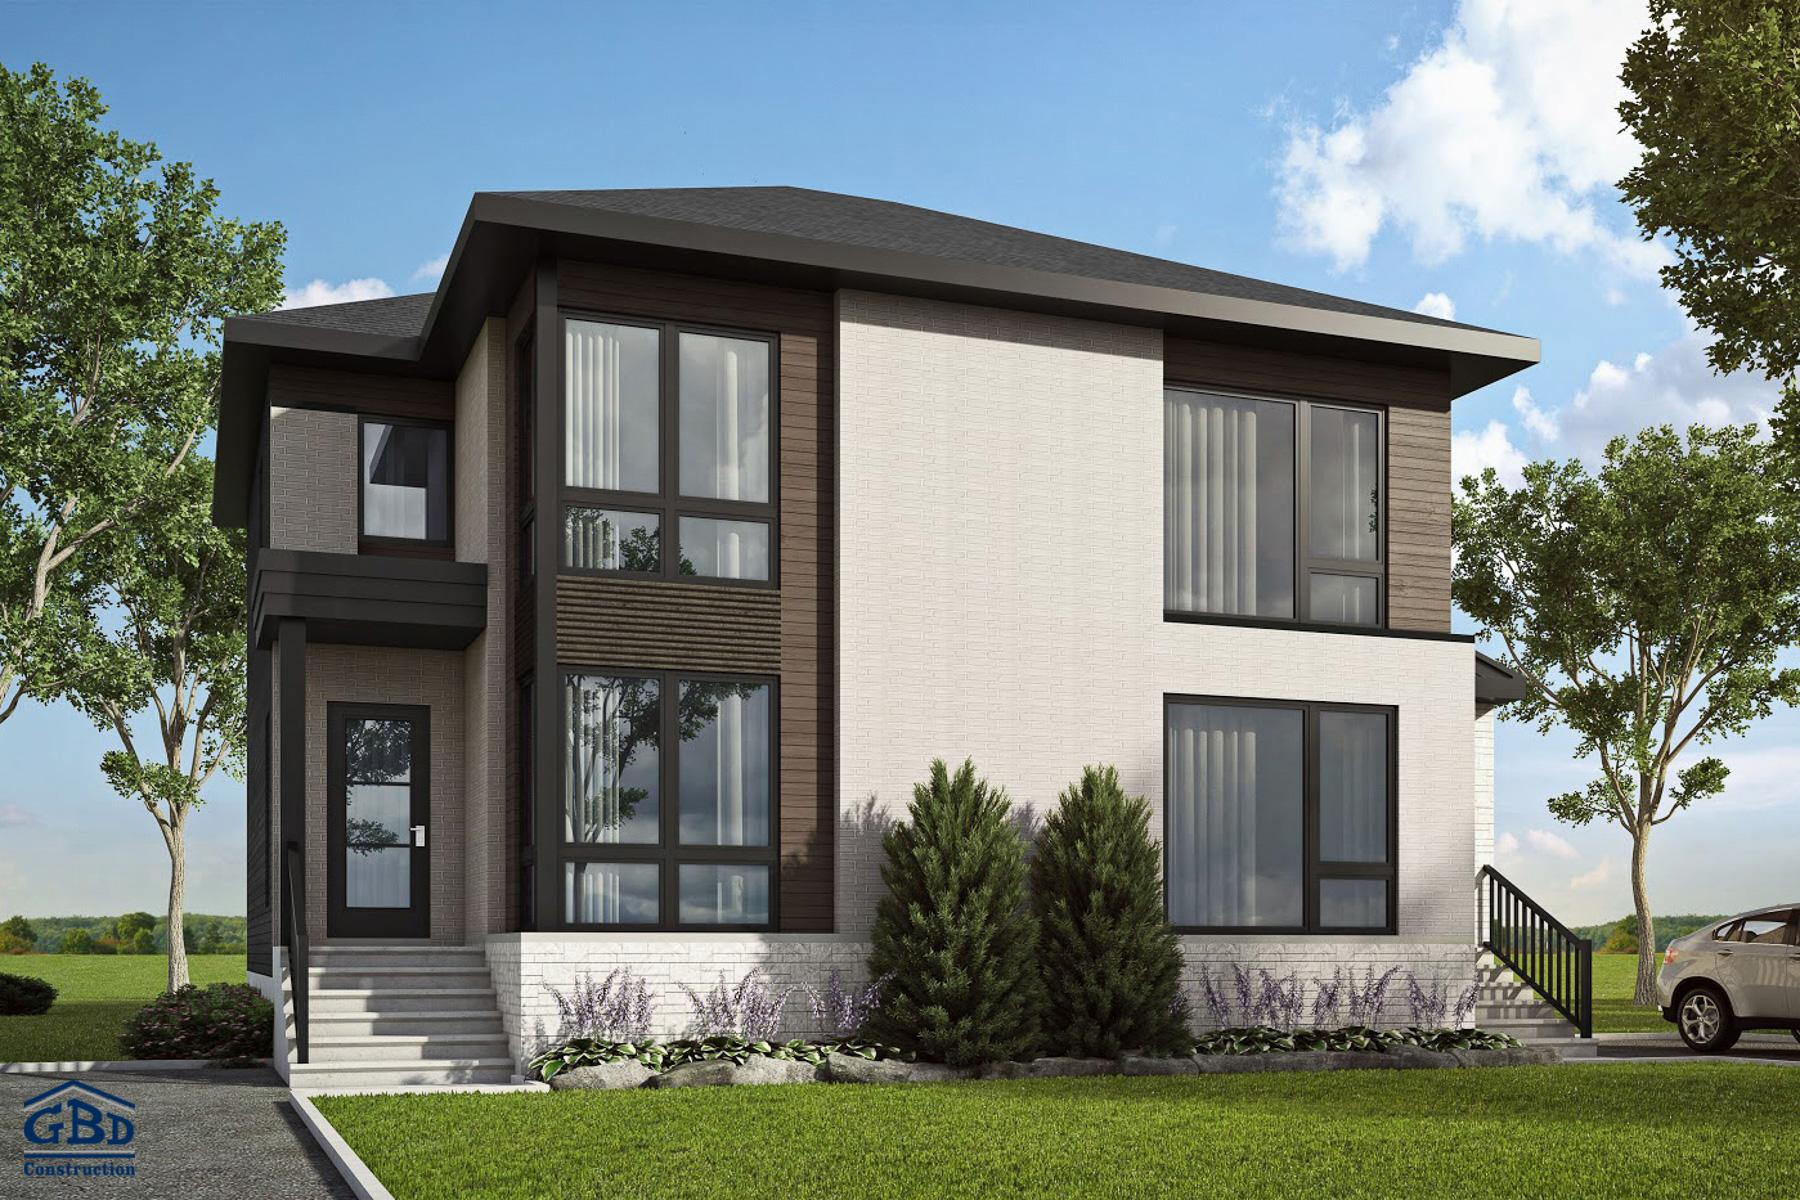 Ch ne maison neuve jumel e gbd construction for Modele maison neuve